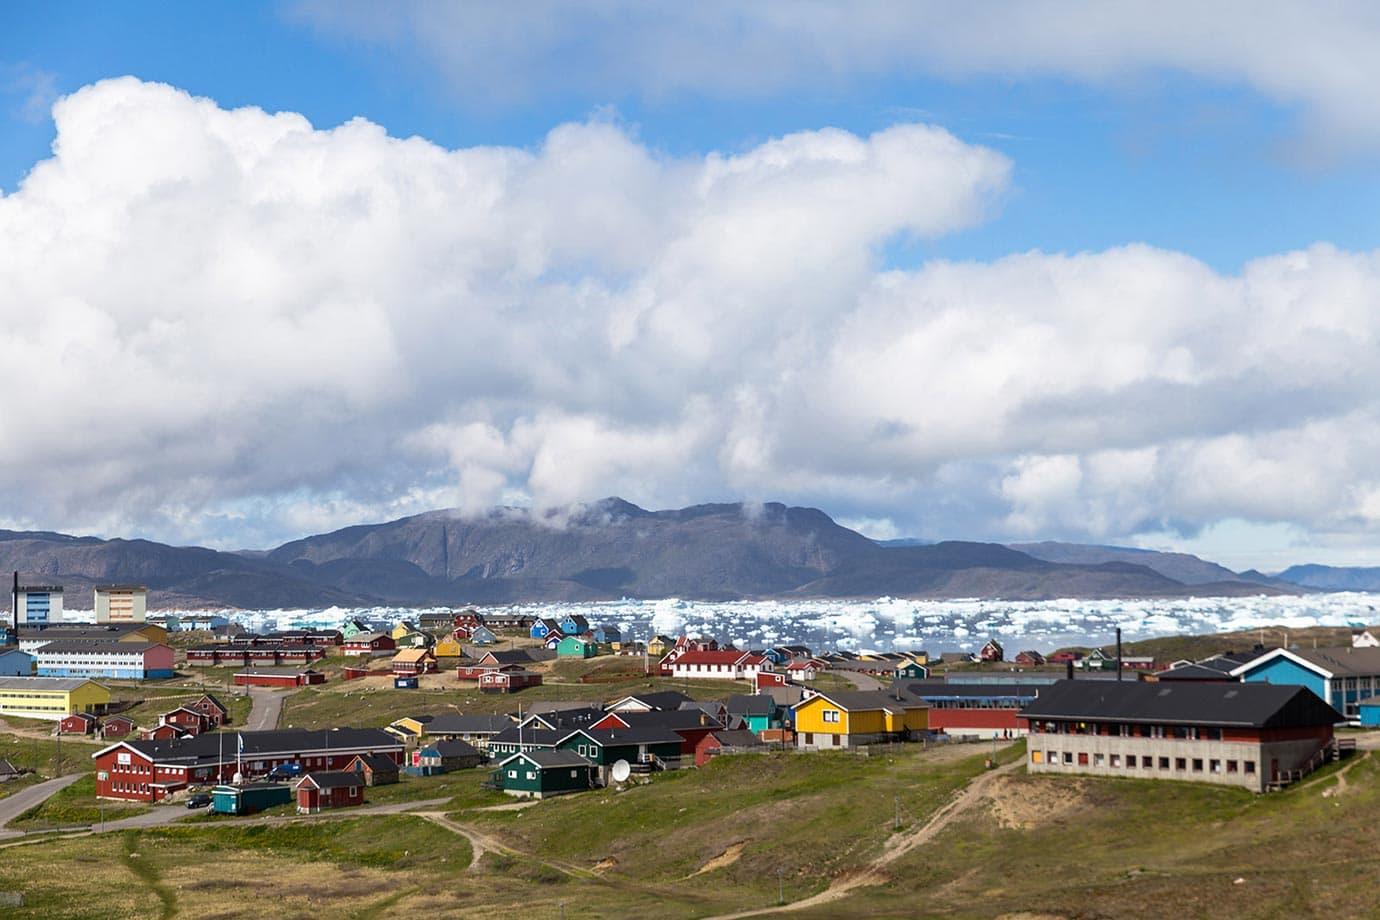 Nuuk, Greenland (Photo: Macca Sherifi)